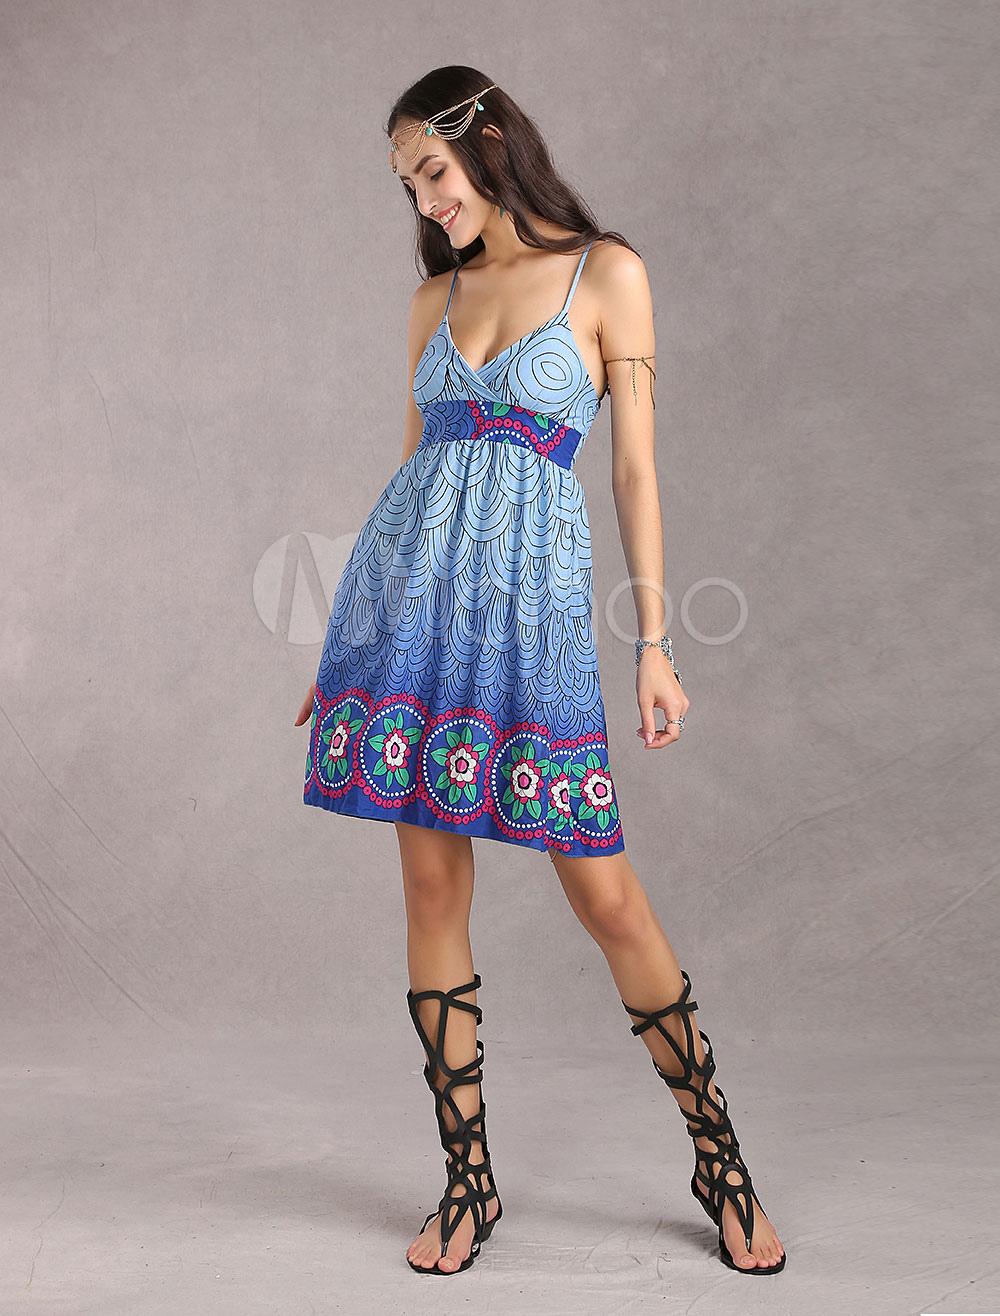 Pink Plaid 100% Cotton Spaghetti Womens Print Dress